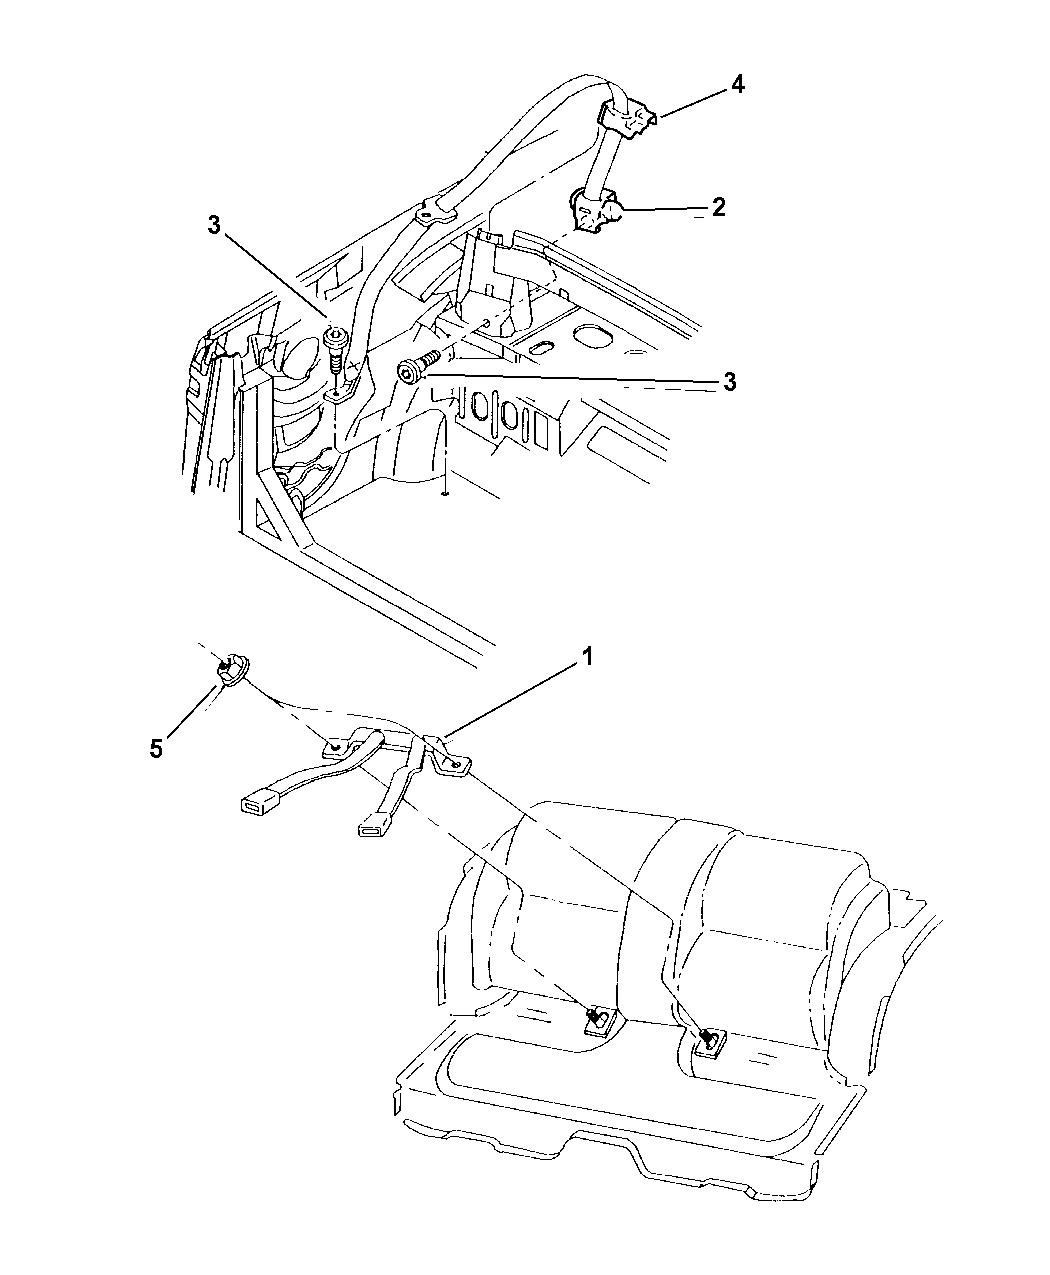 1999 Chrysler Sebring Convertible Rear Seat Belt